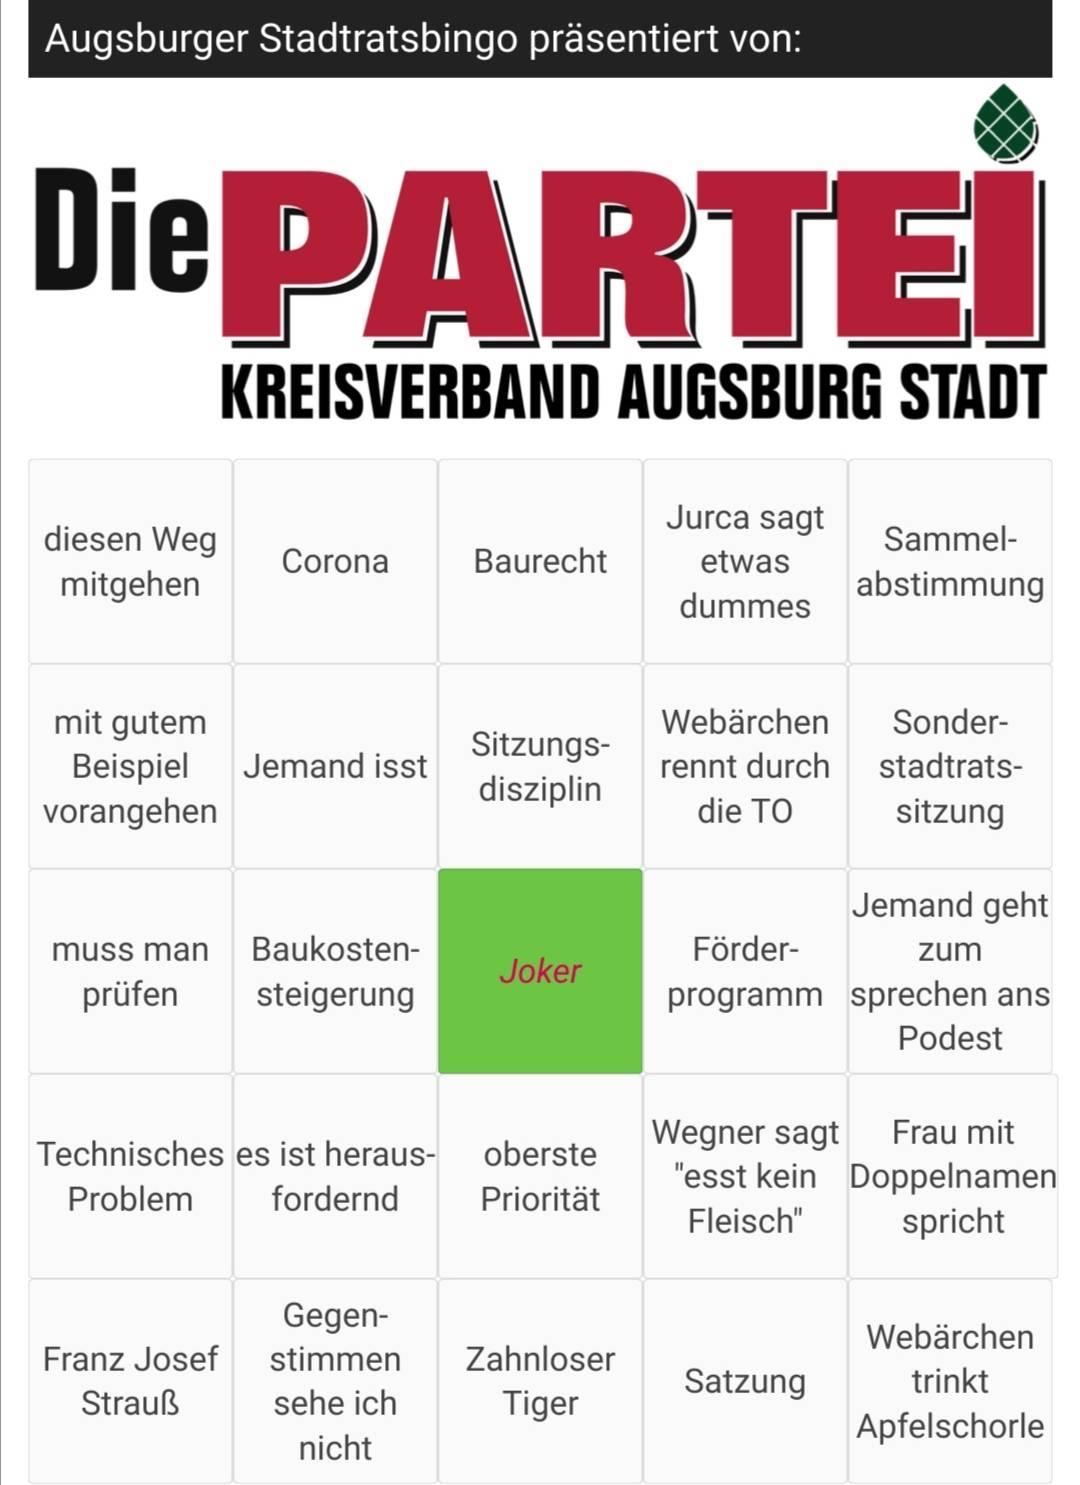 Das offizielle Augsburger Stadtrat-Bingo ist da